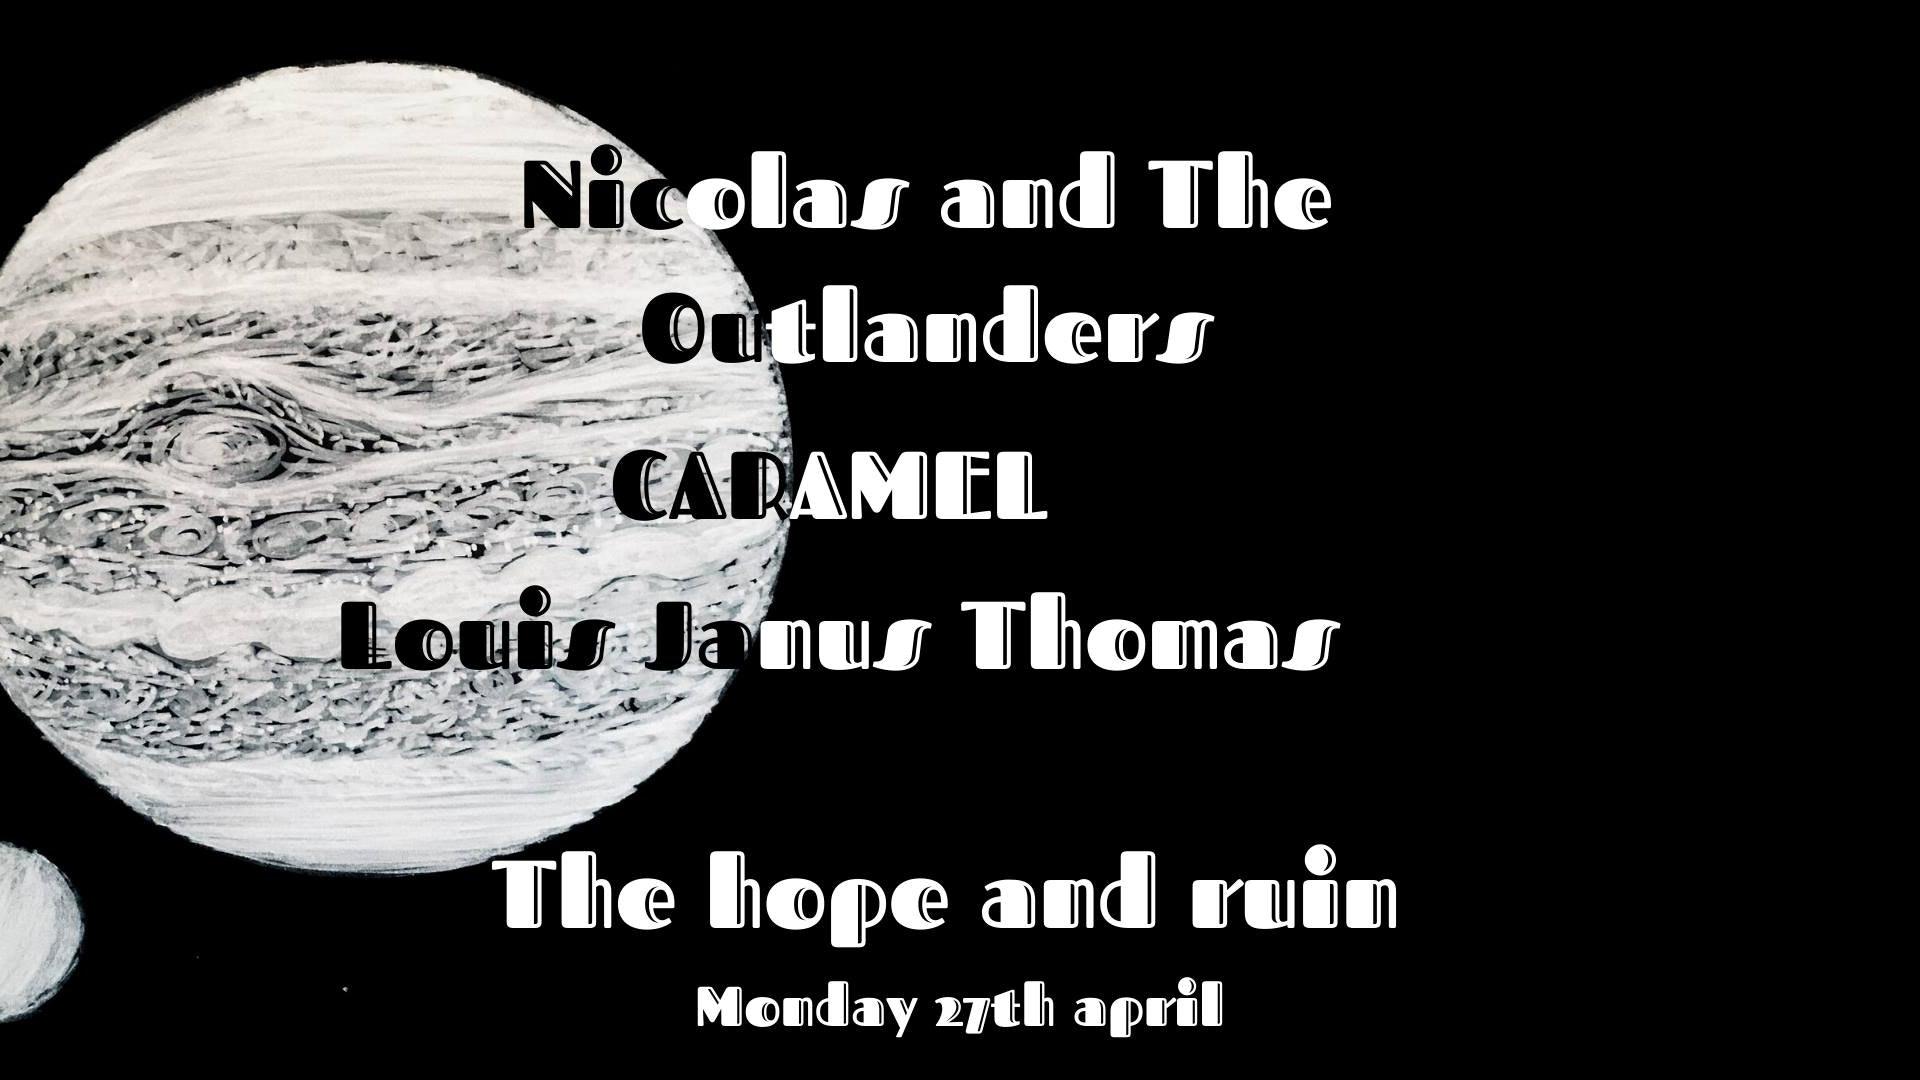 *CANCELLED* Nicolas & The Outlanders + Caramel + Louis Janus Thomas